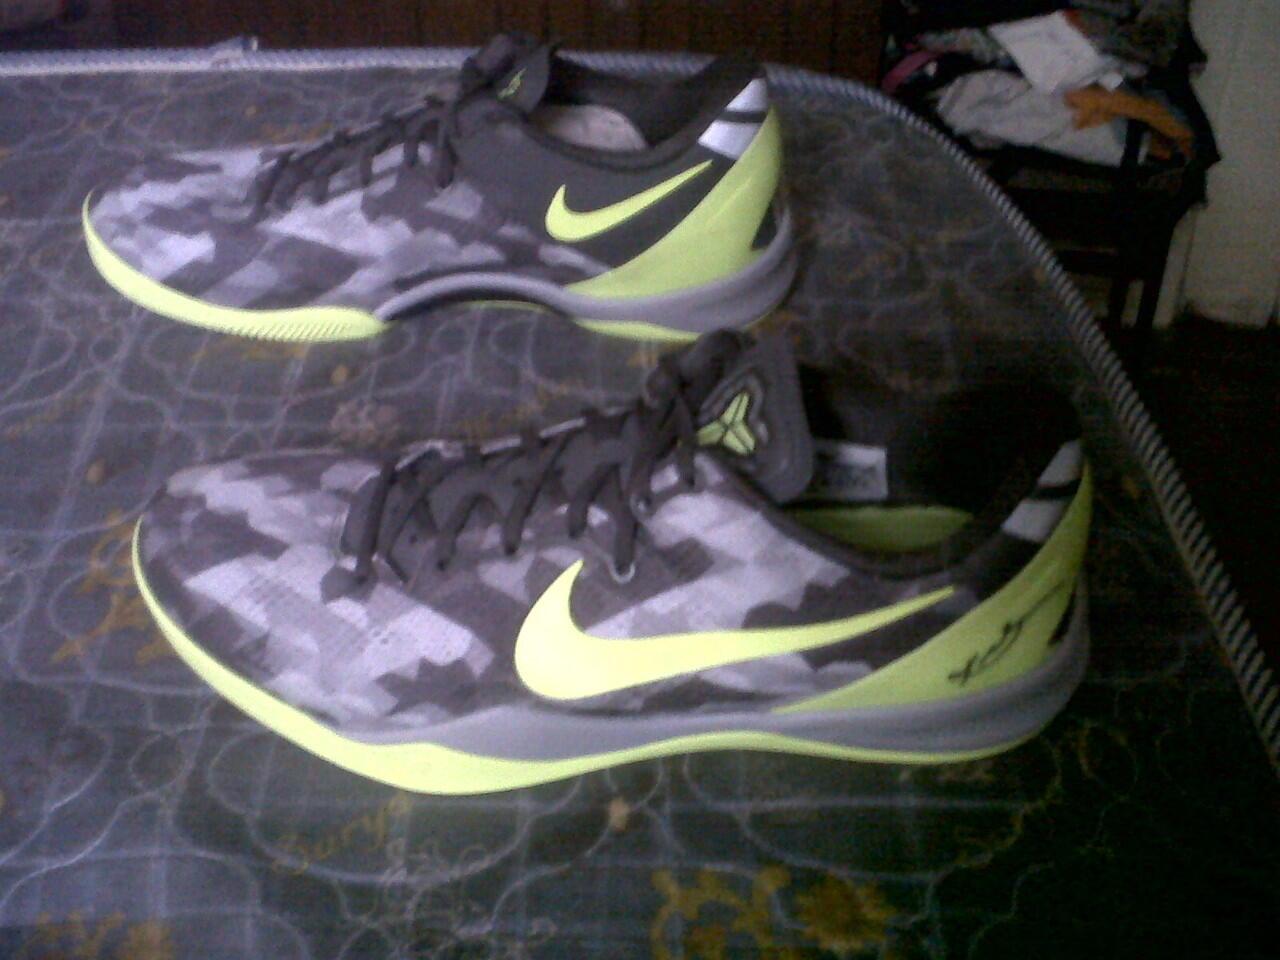 Terjual wts Nike Kobe 8 system Grey volt (original) size 47  6087d16ec7